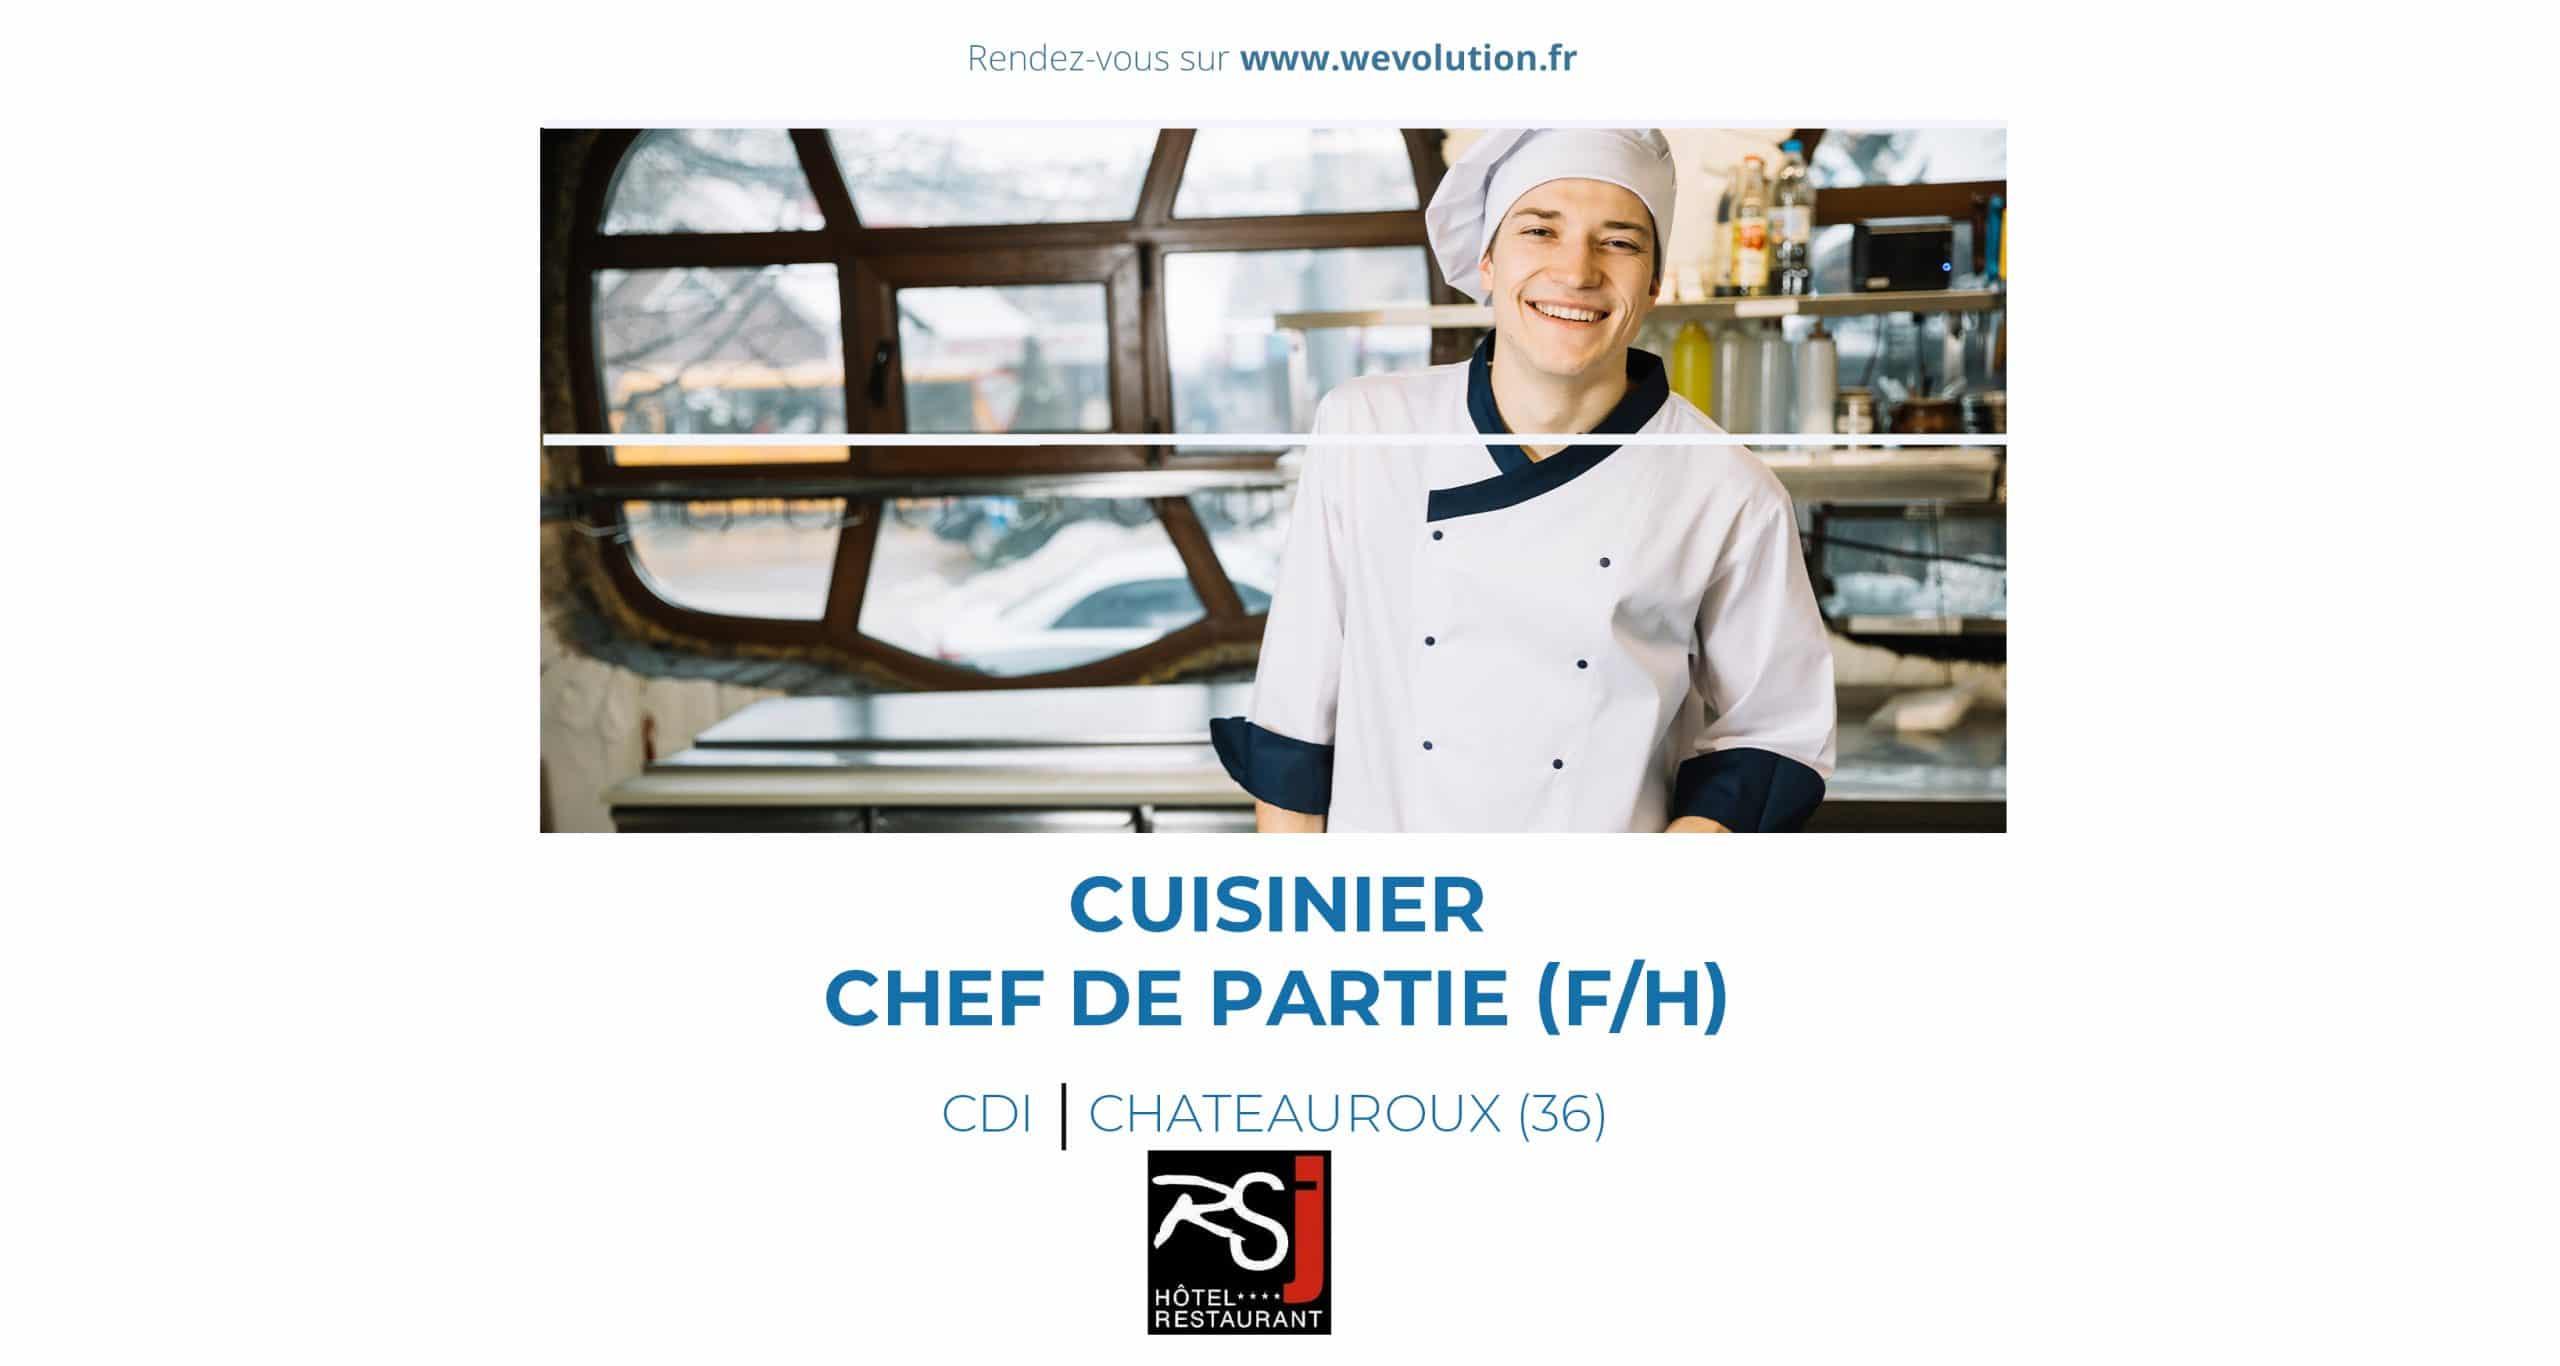 CUISINIER – CHEF DE PARTIE (F/H)